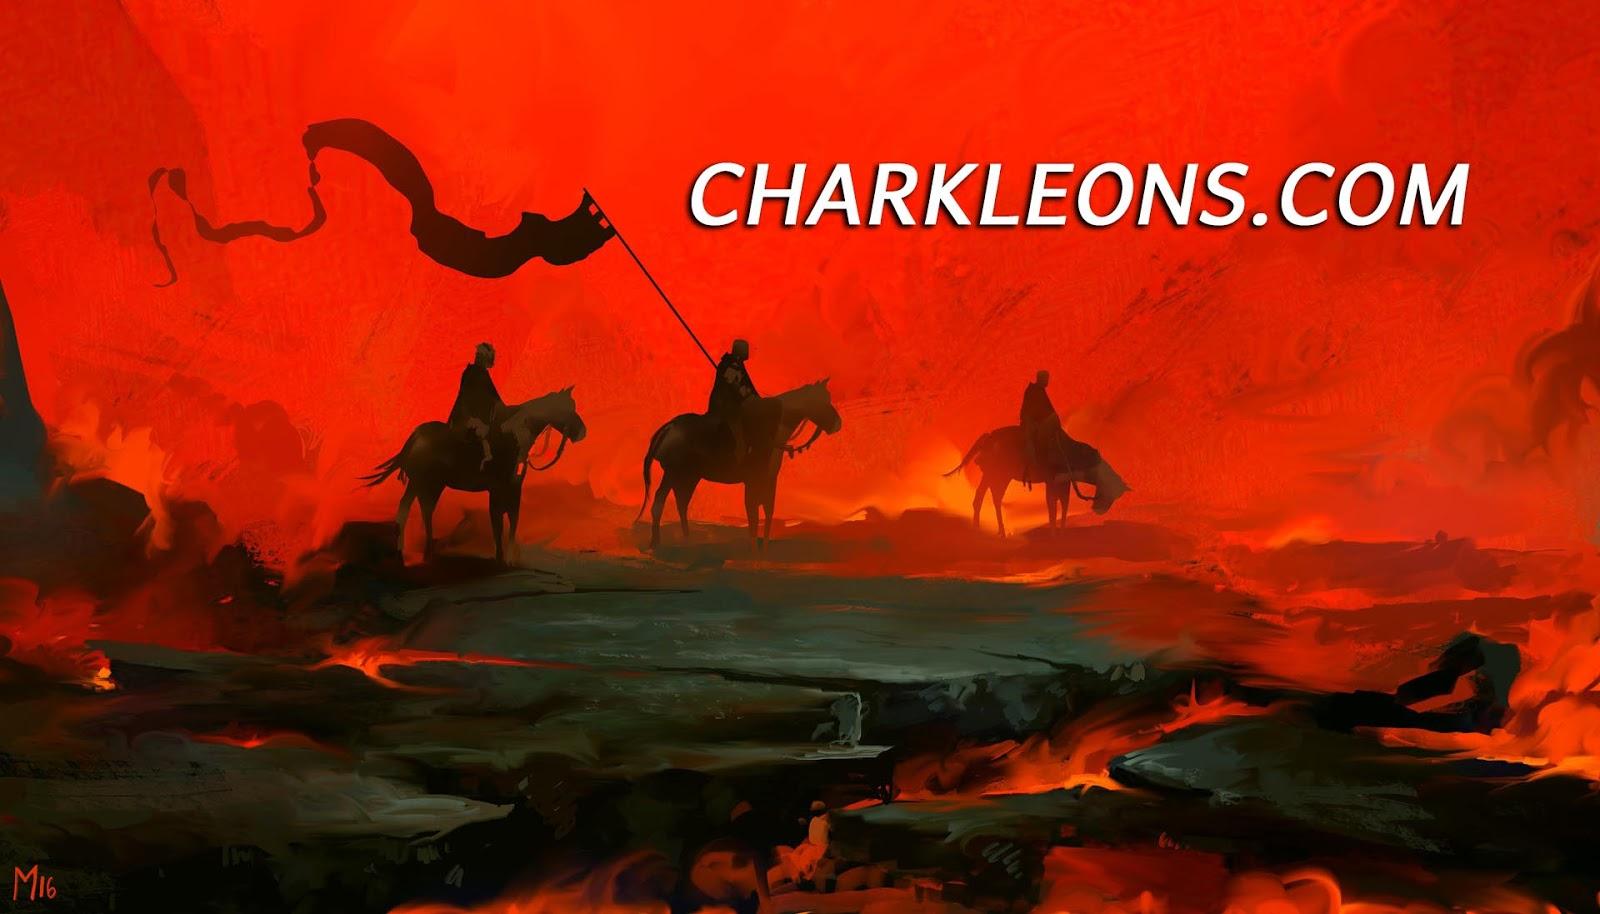 Imágenes o Banners con movimiento - Charkleons.com